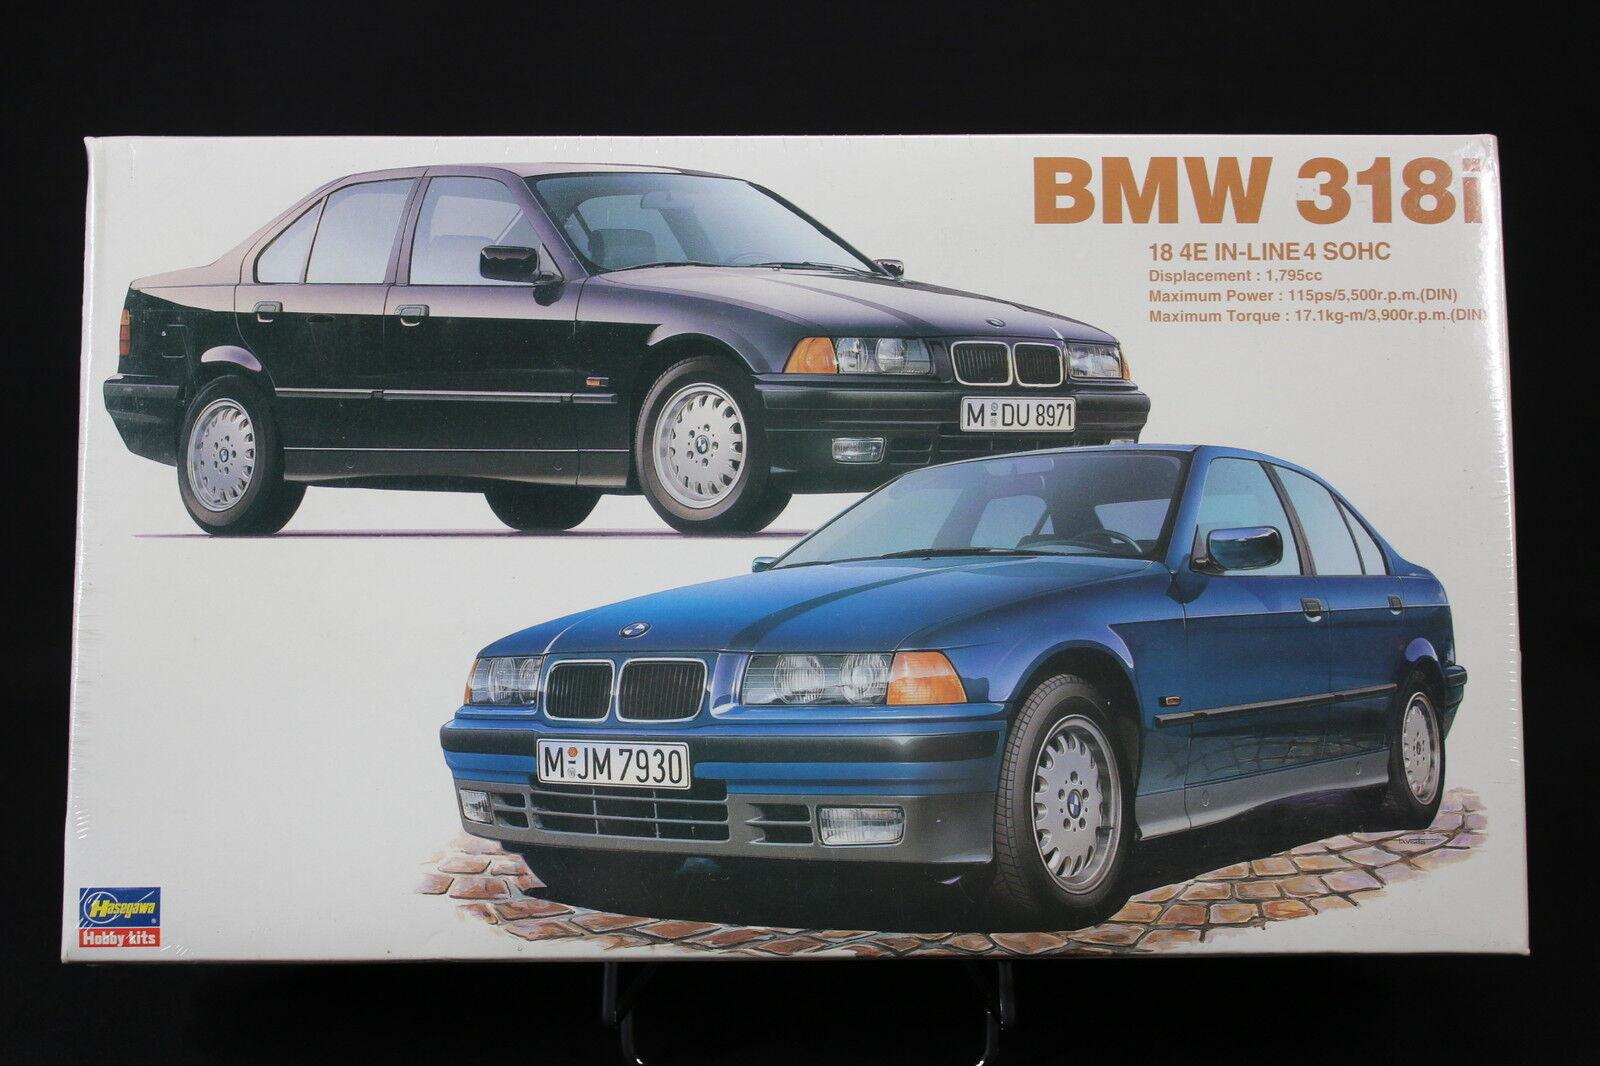 XO033 HASEGAWA 1/24 maquette voiture 24016 CD016 2000 BMW 318i metallic blu